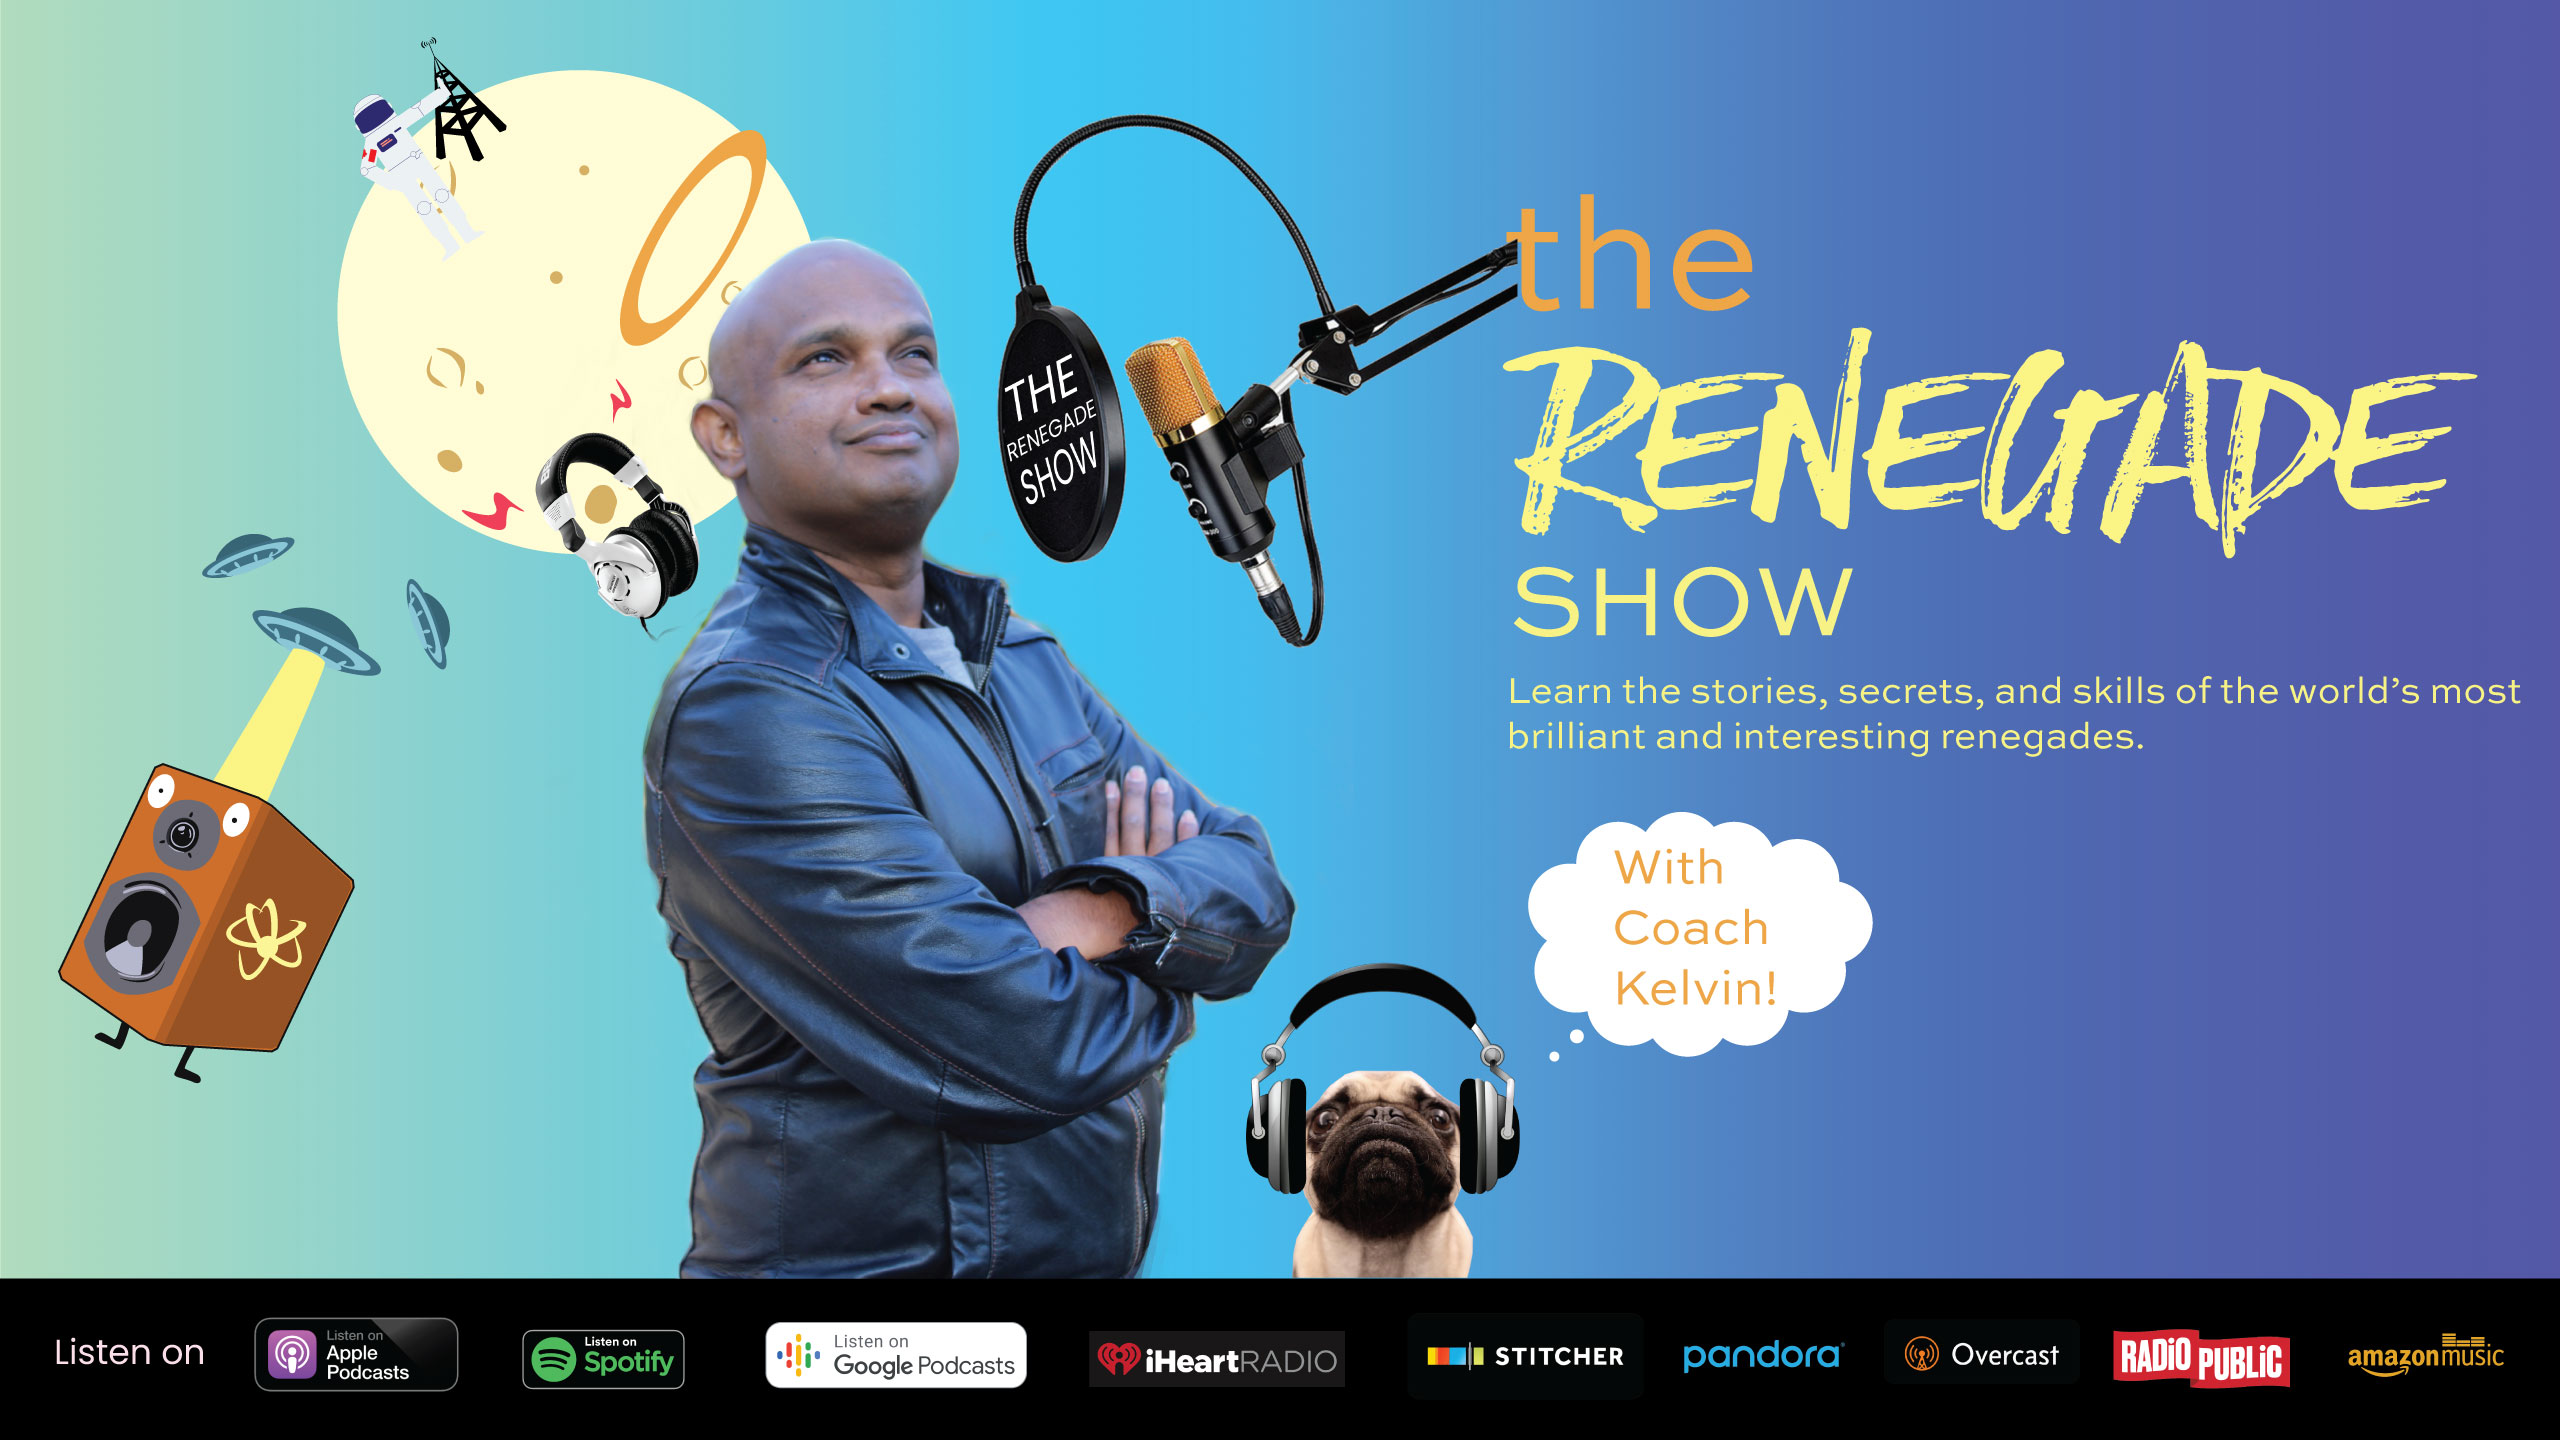 The Renegade Show